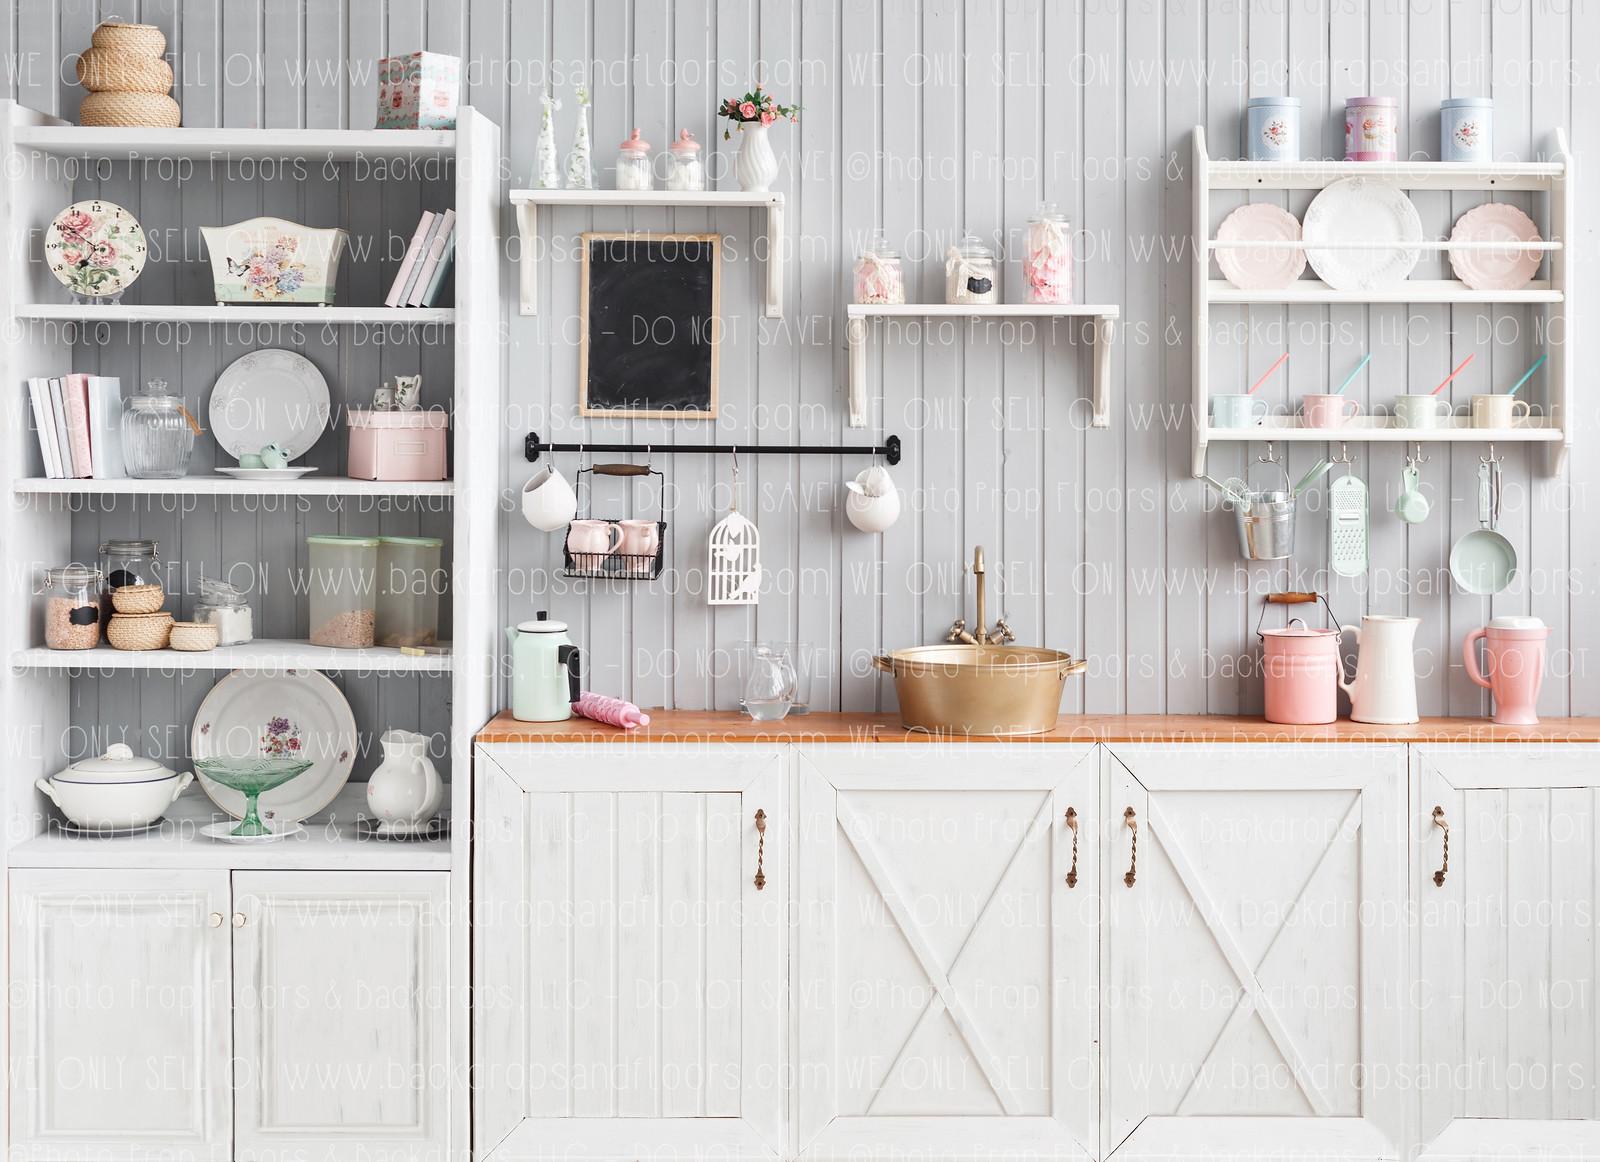 Valentine S Day Kitchen Or Easter Kitchen Backdrop